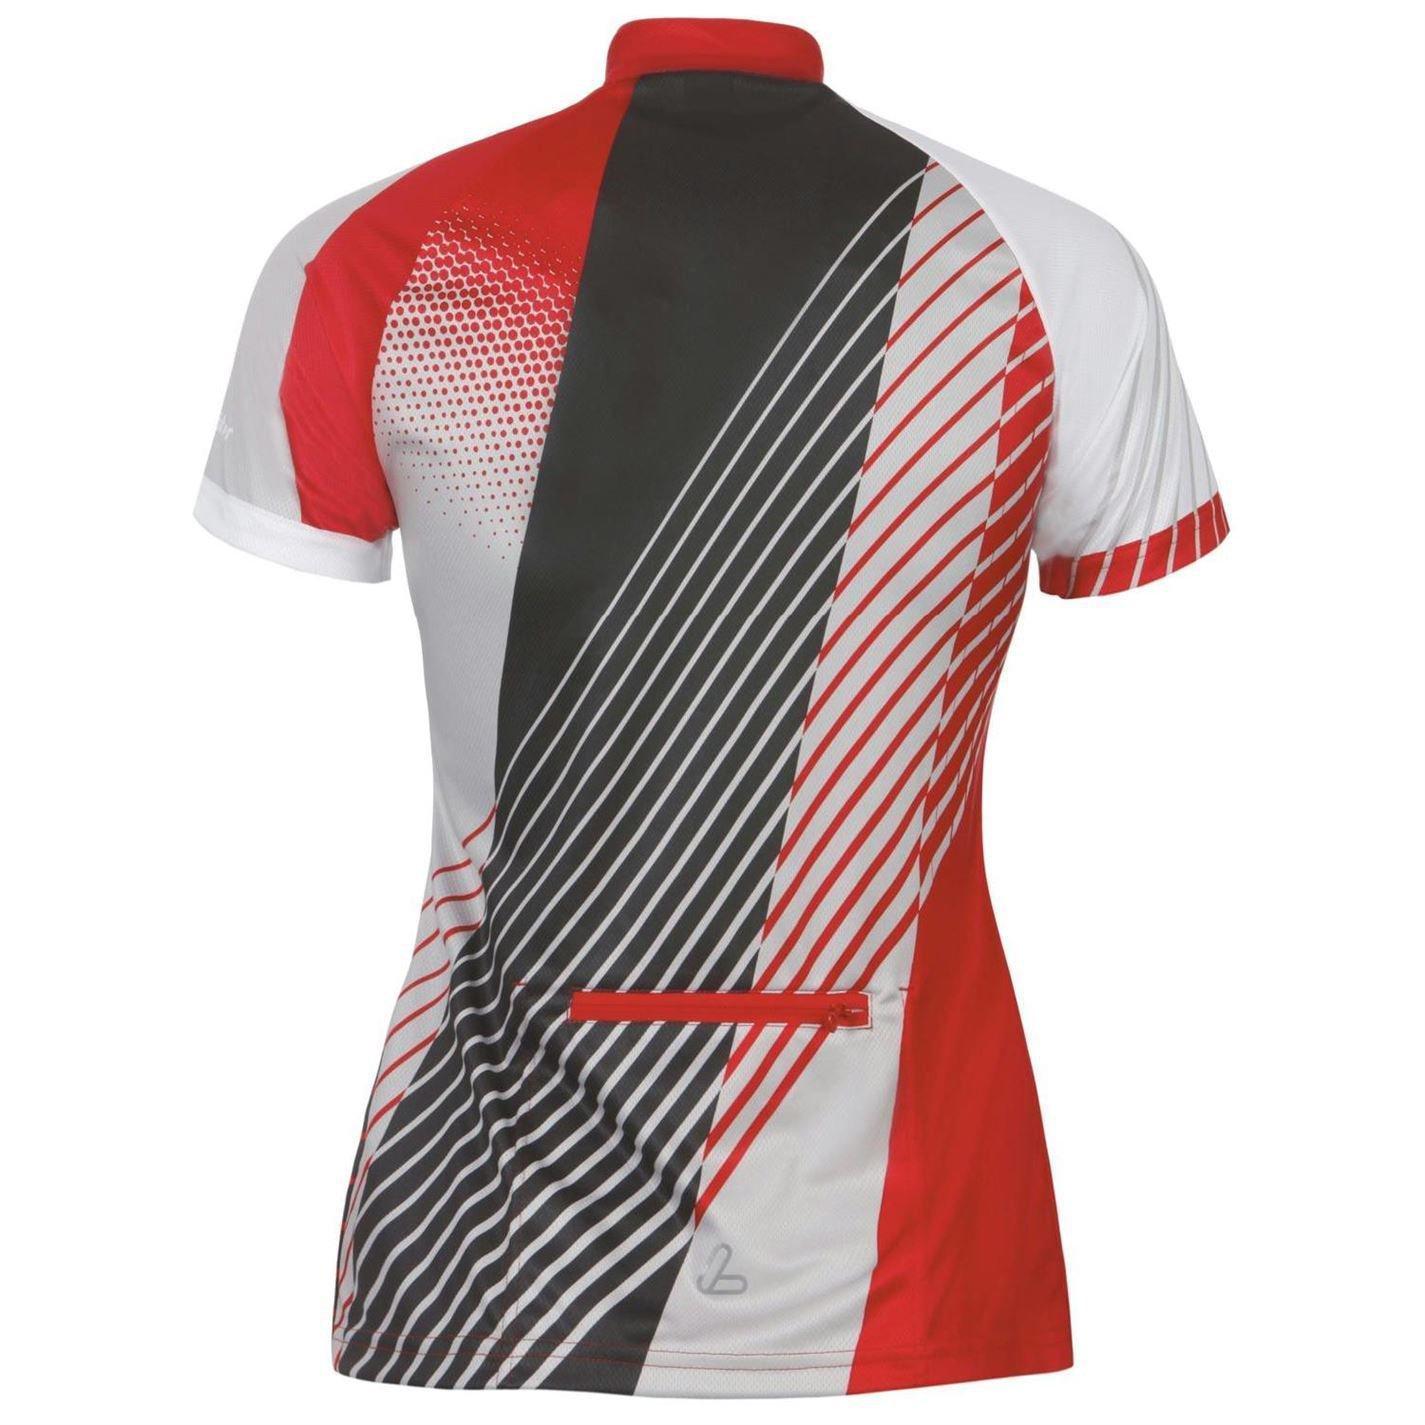 Löffler Womens Perform Jersey Ladies Short Sleeve Cycle Cycling Sports Shirt Top